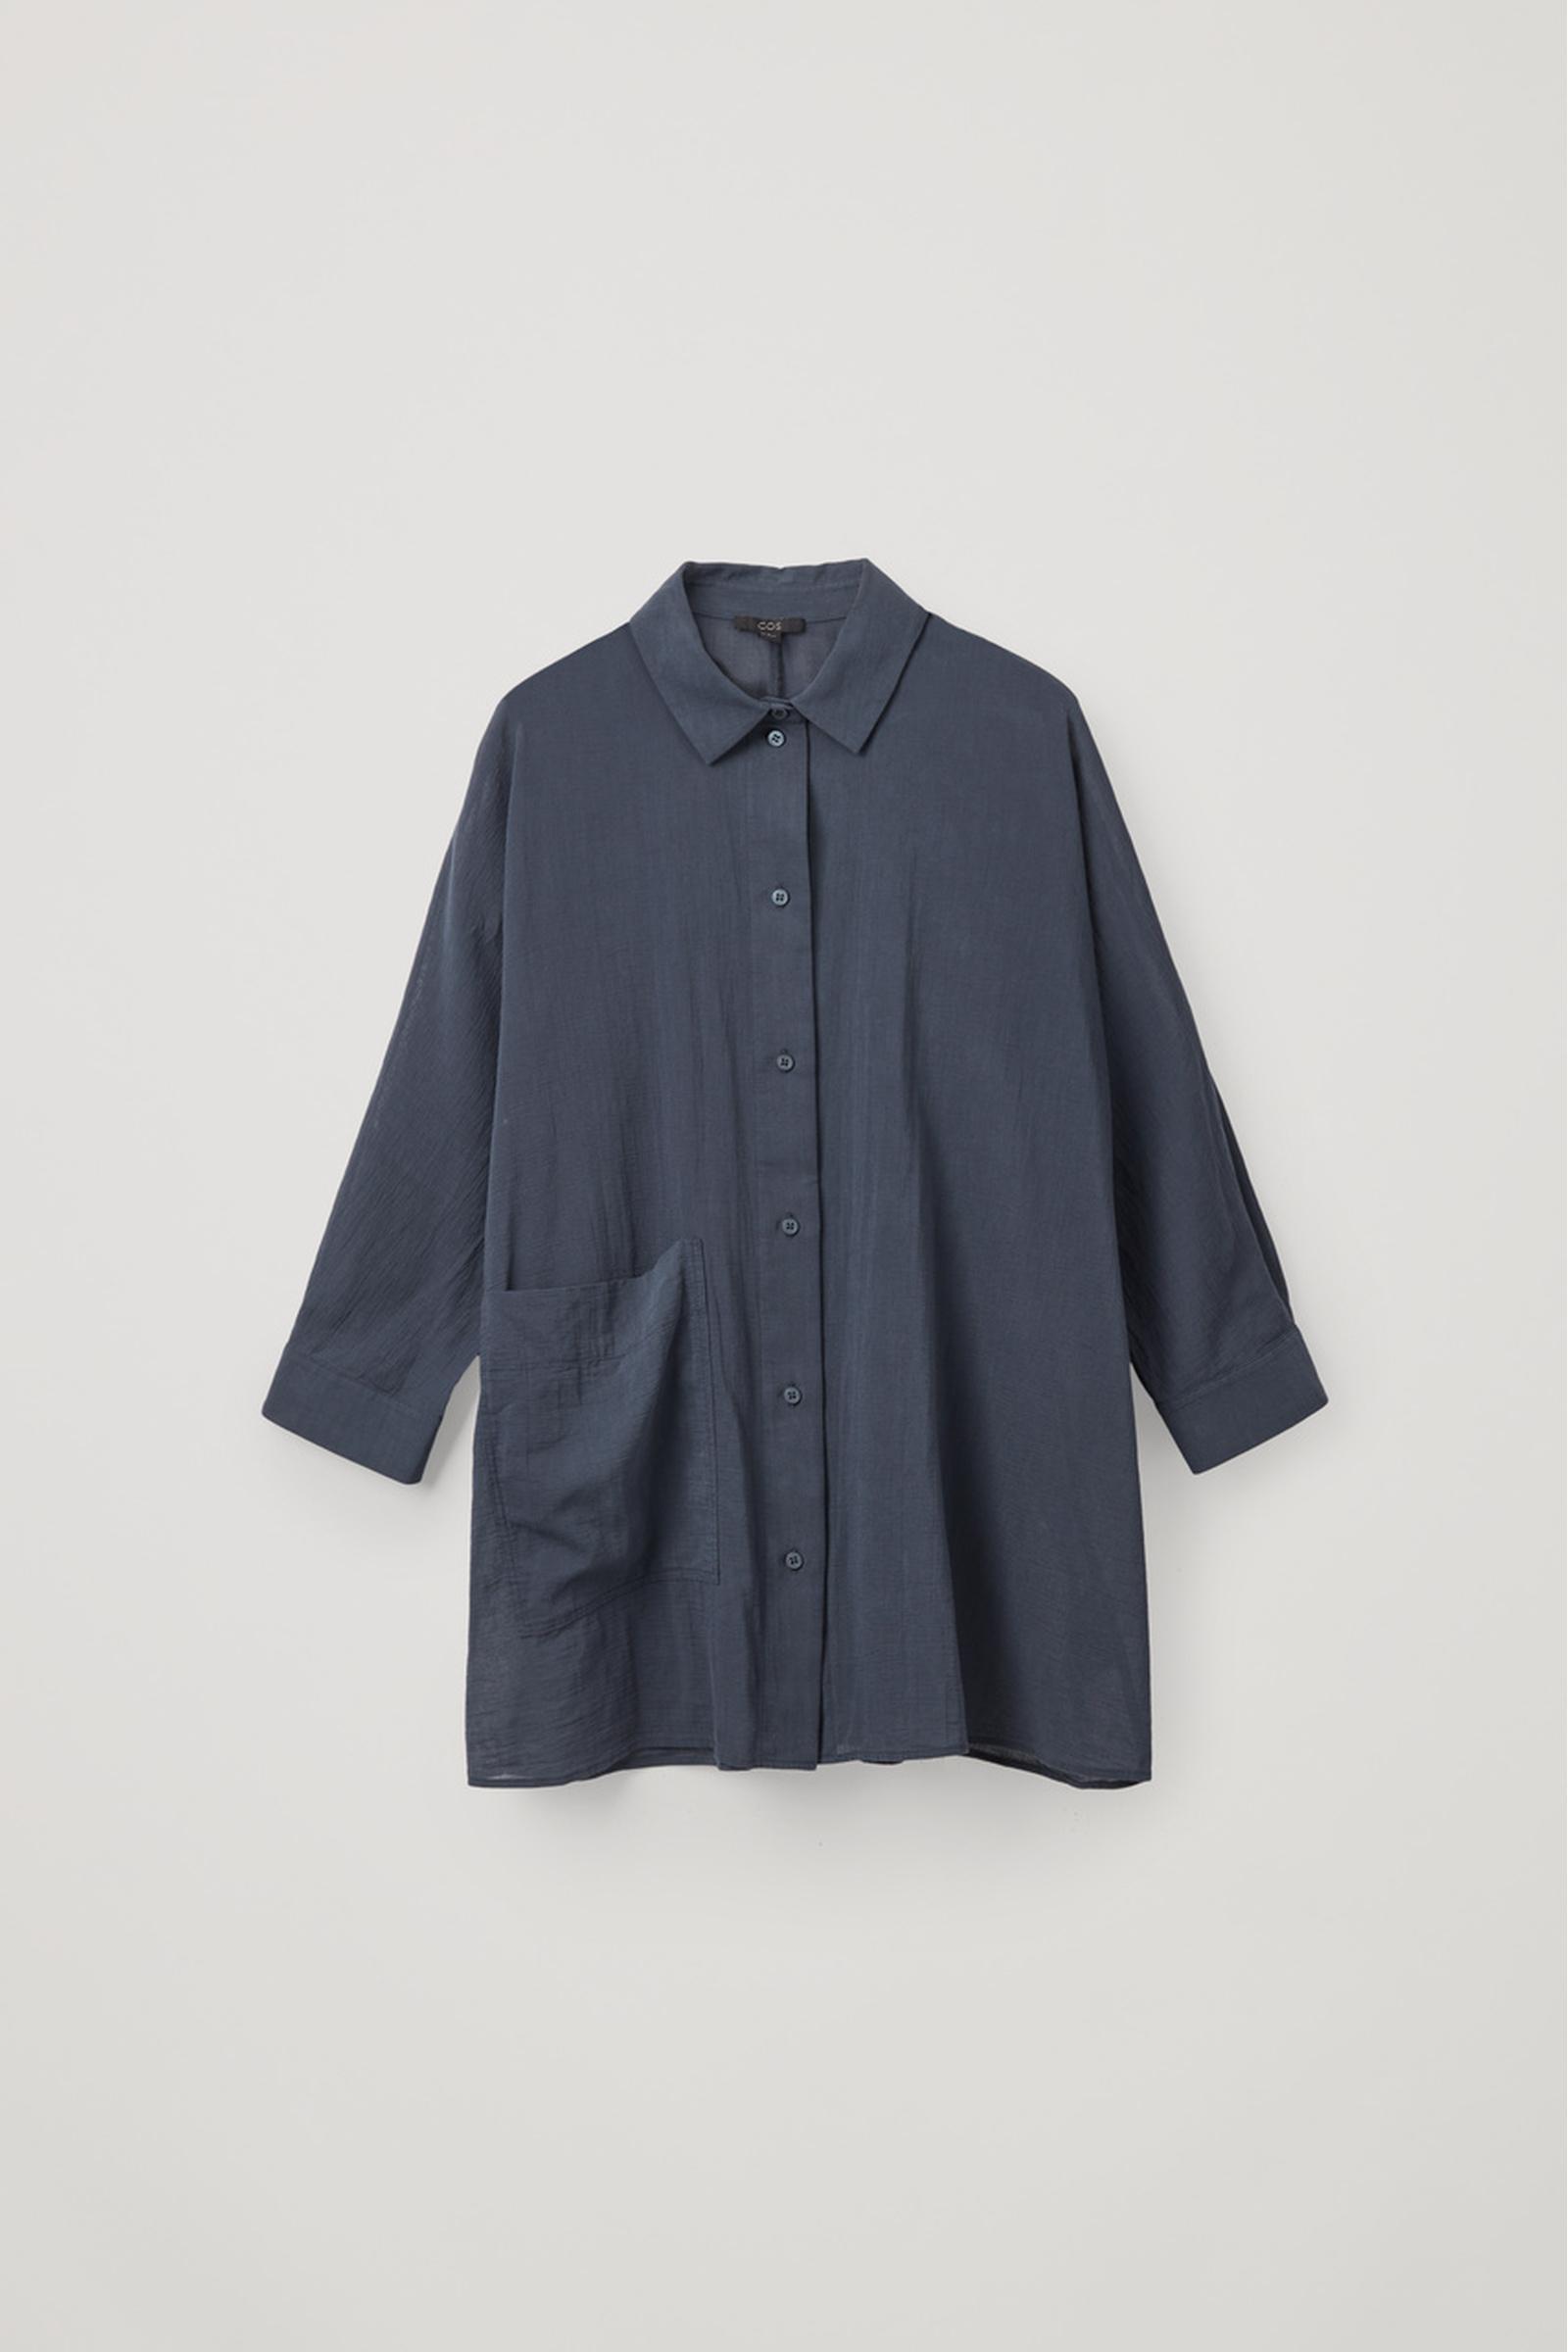 COS 오버사이즈 튜닉 셔츠의 네이비컬러 Product입니다.